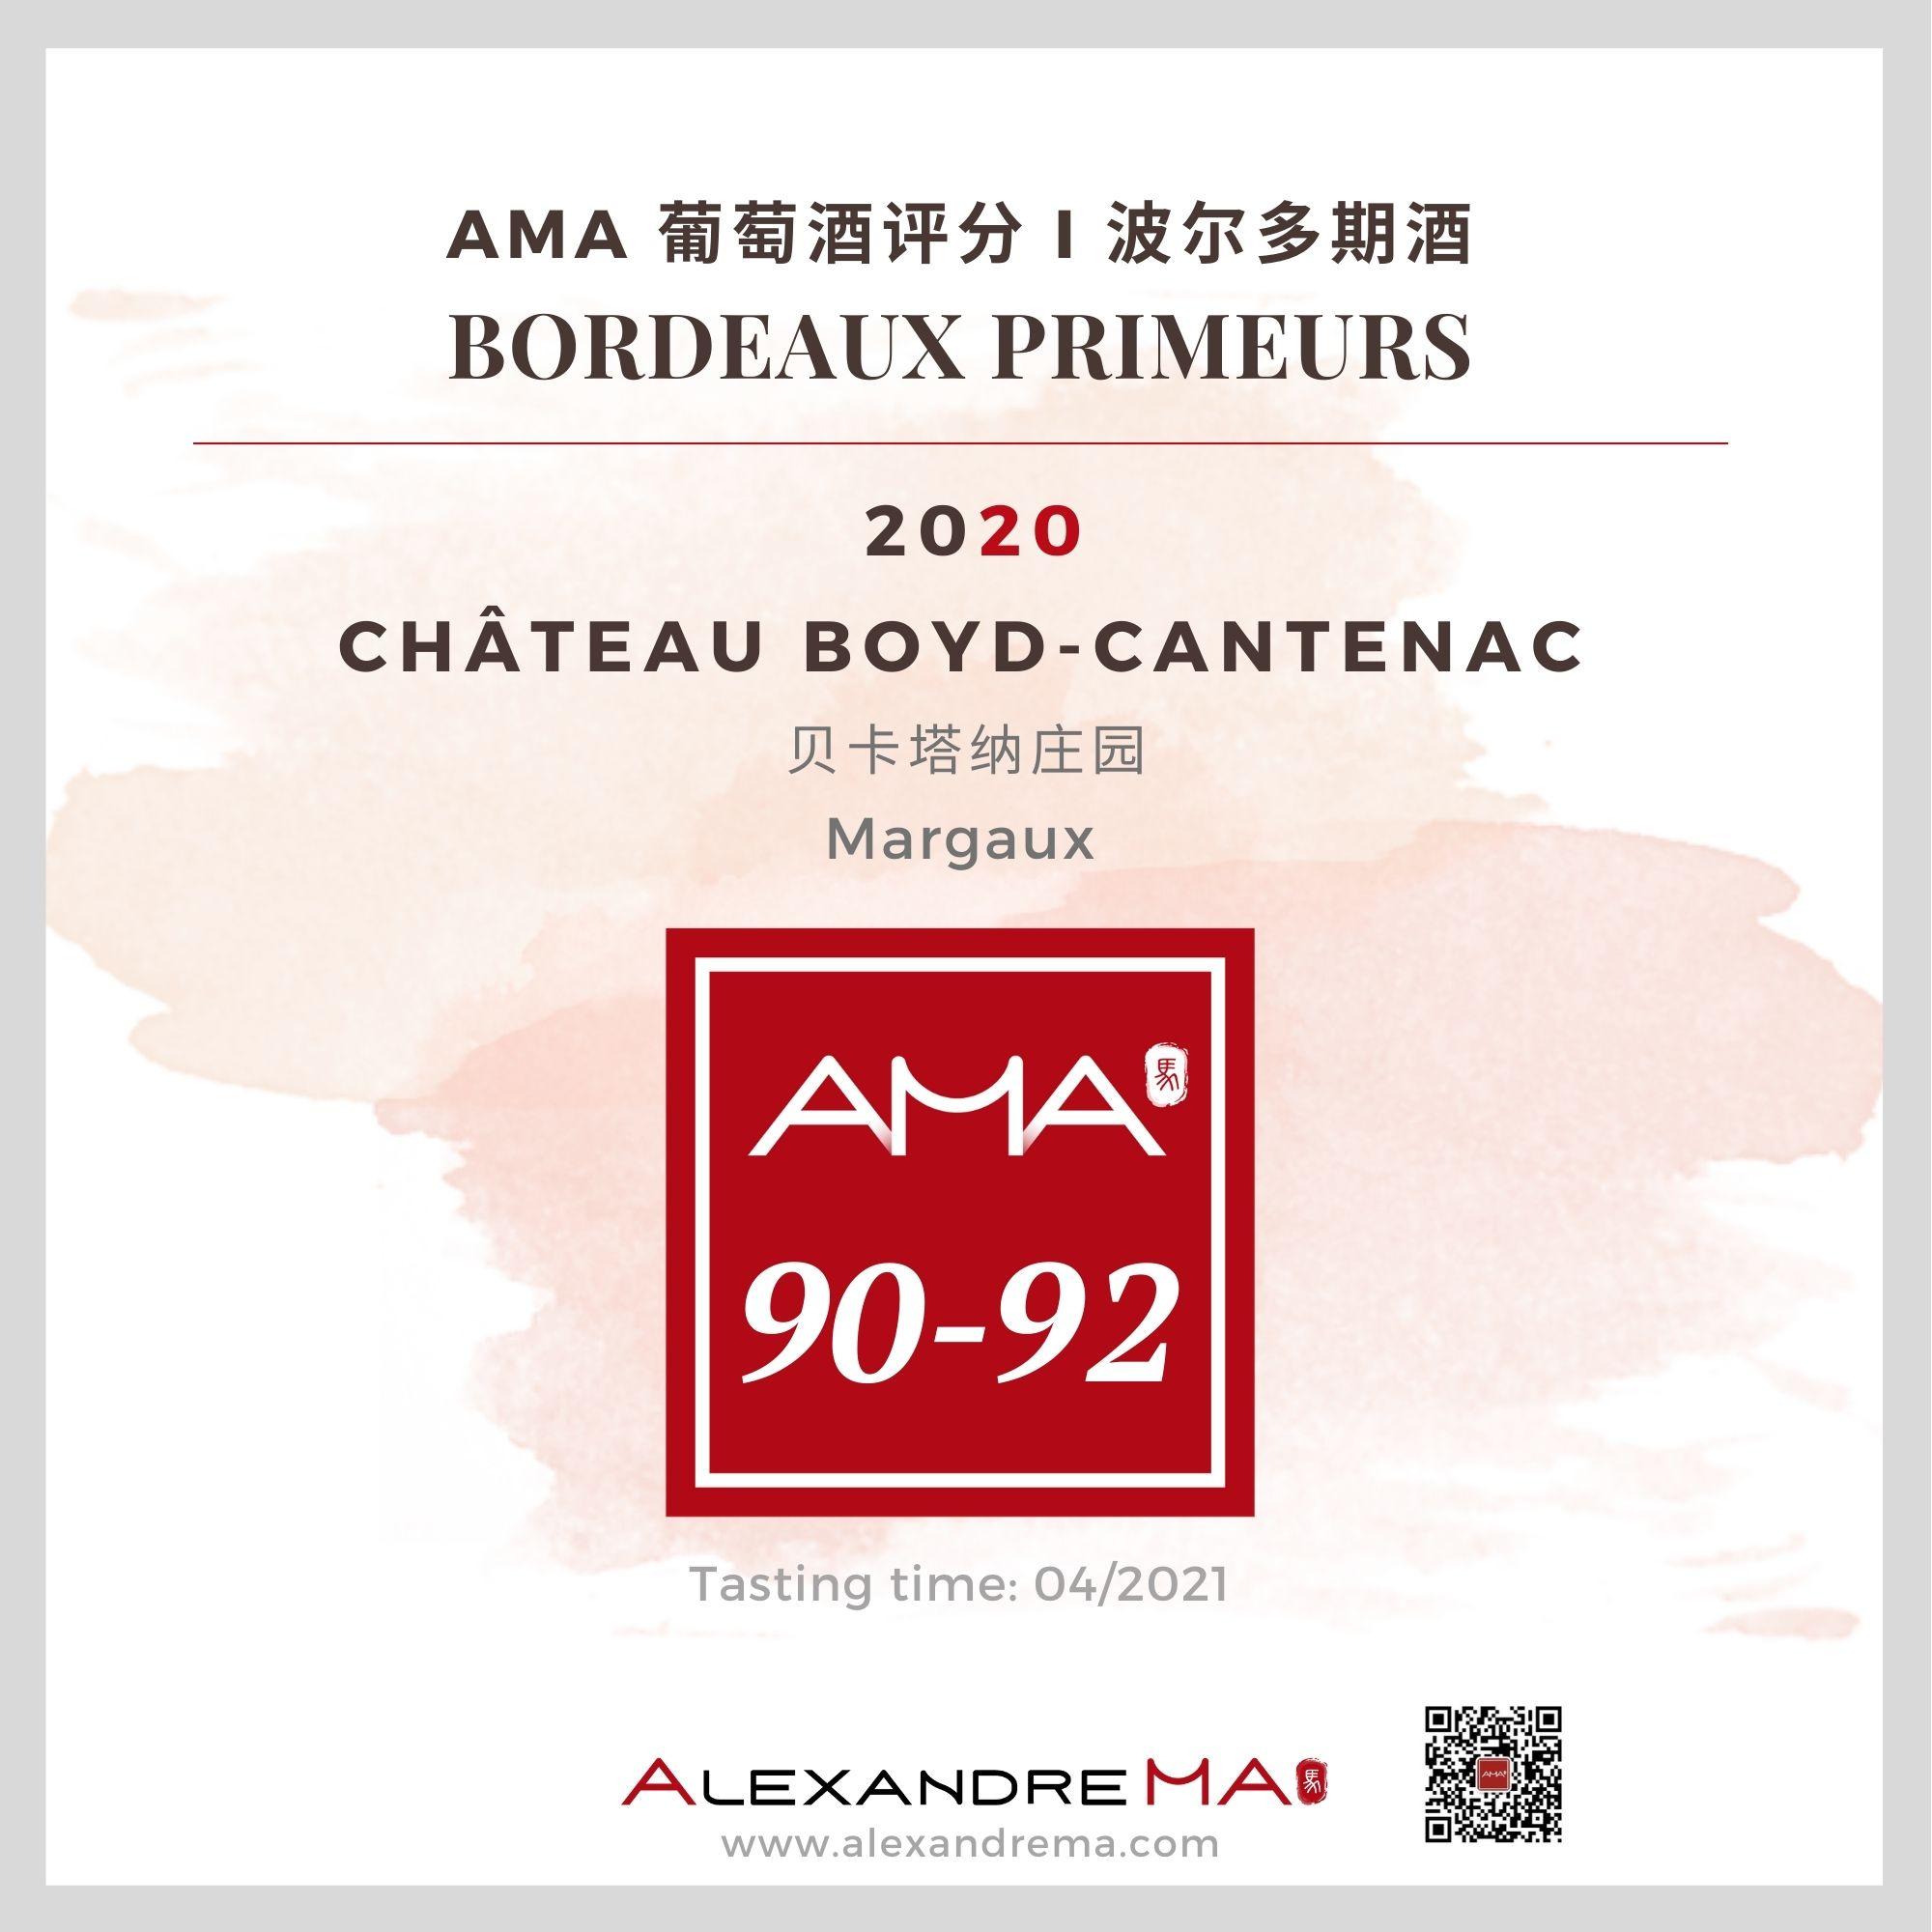 Château Boyd-Cantenac 2020 - Alexandre MA